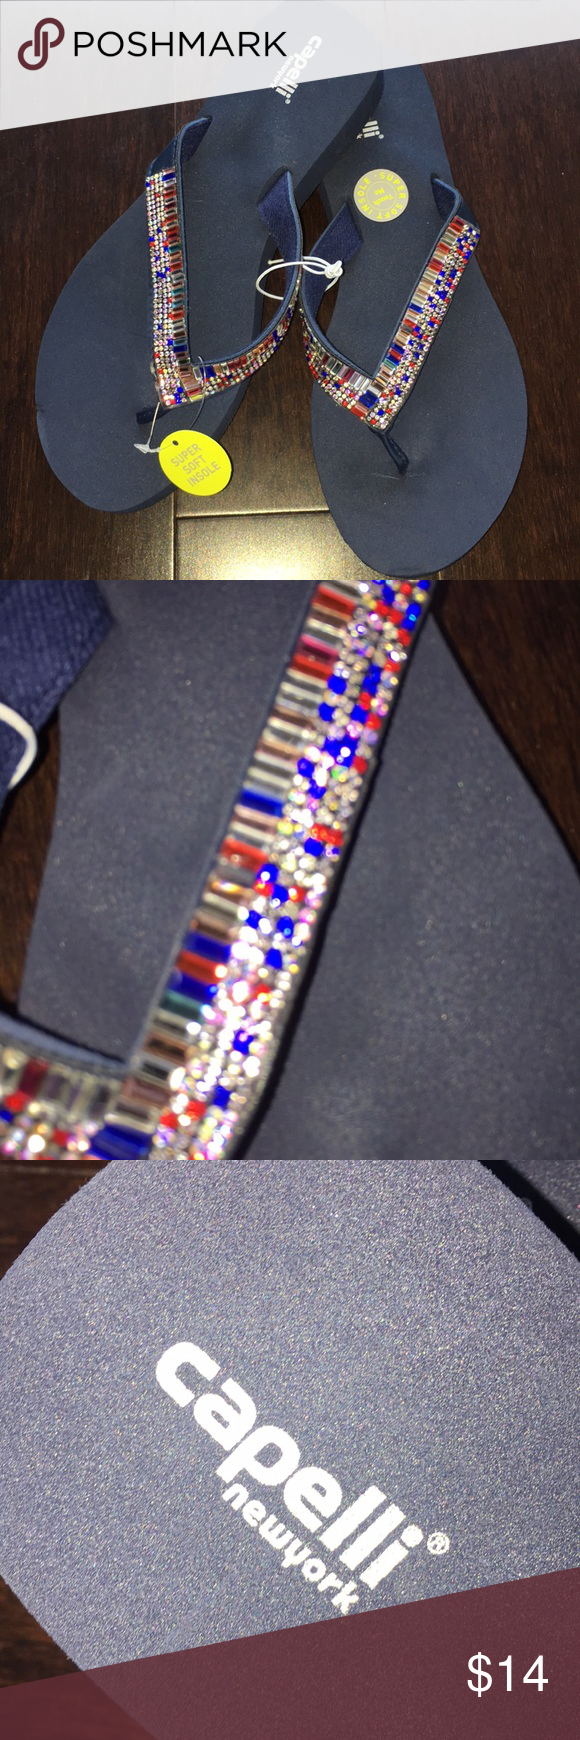 Capelli Ny Navy Rubber Sandal Navy Blue With Rhinestone -8234